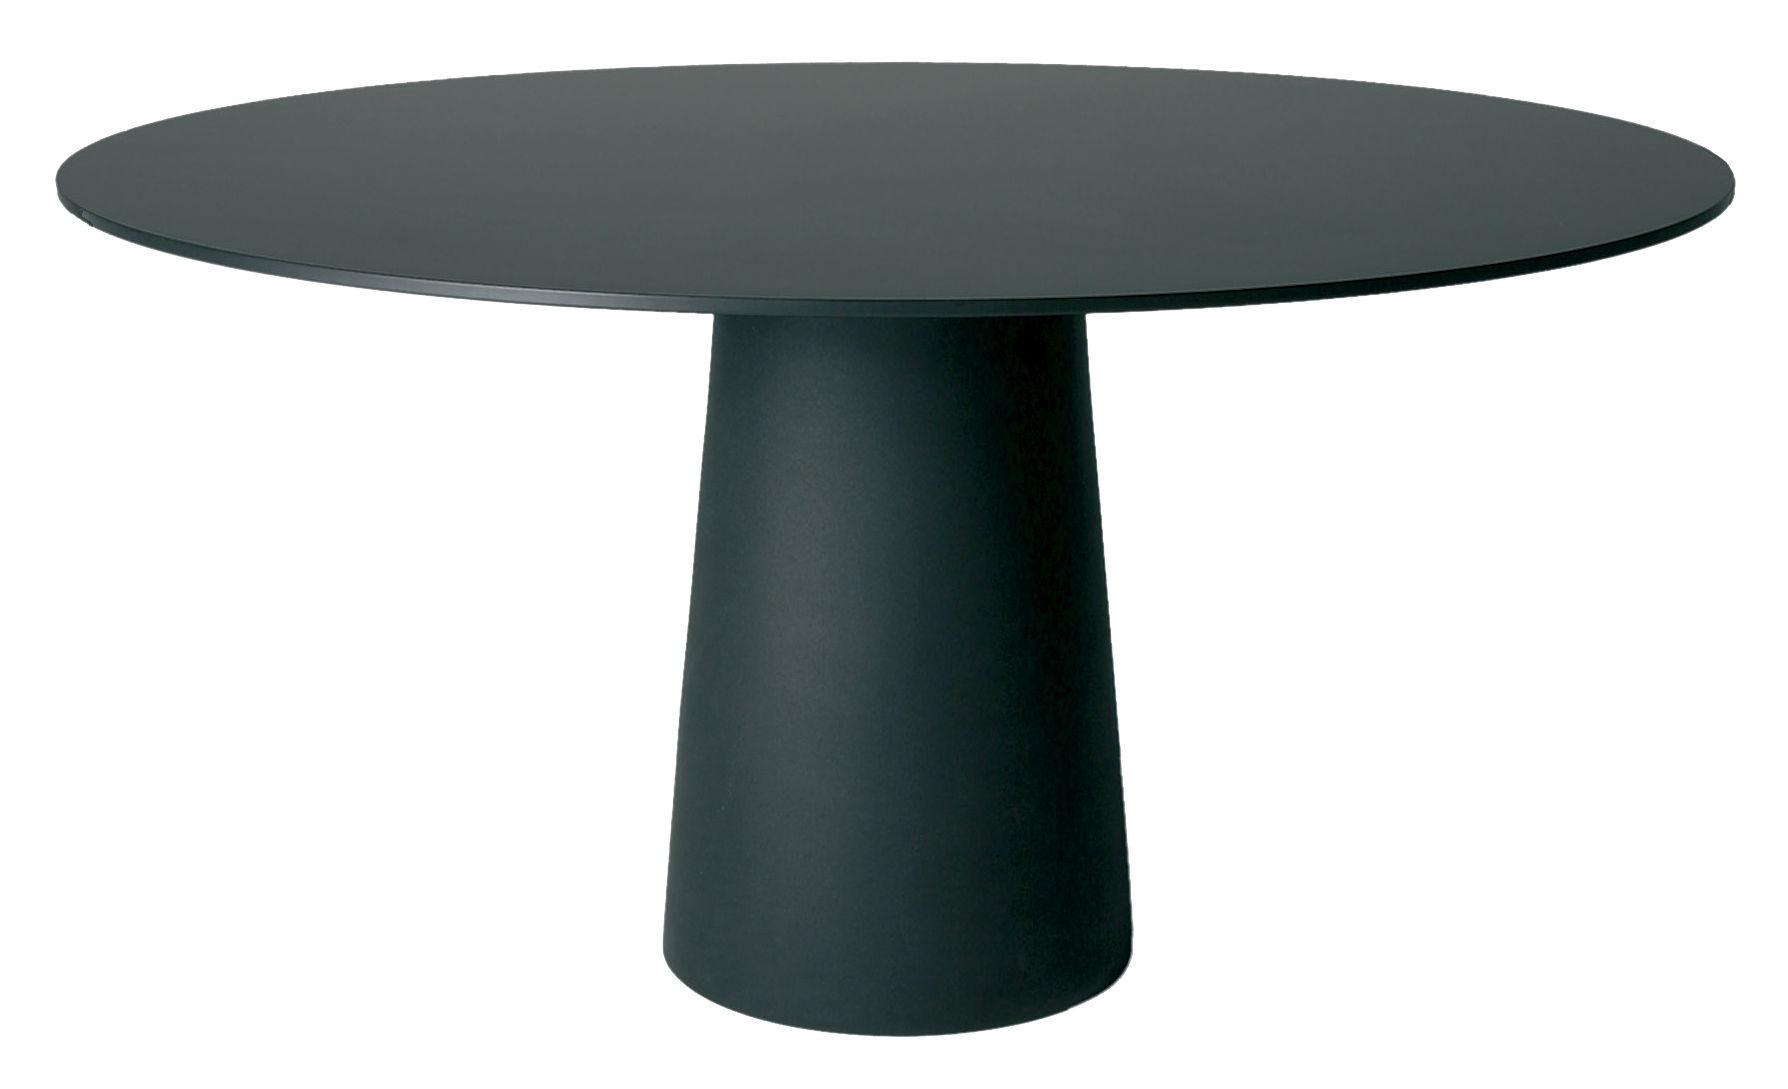 plateau de table container 160 cm plateau noir 160 cm moooi made in design. Black Bedroom Furniture Sets. Home Design Ideas